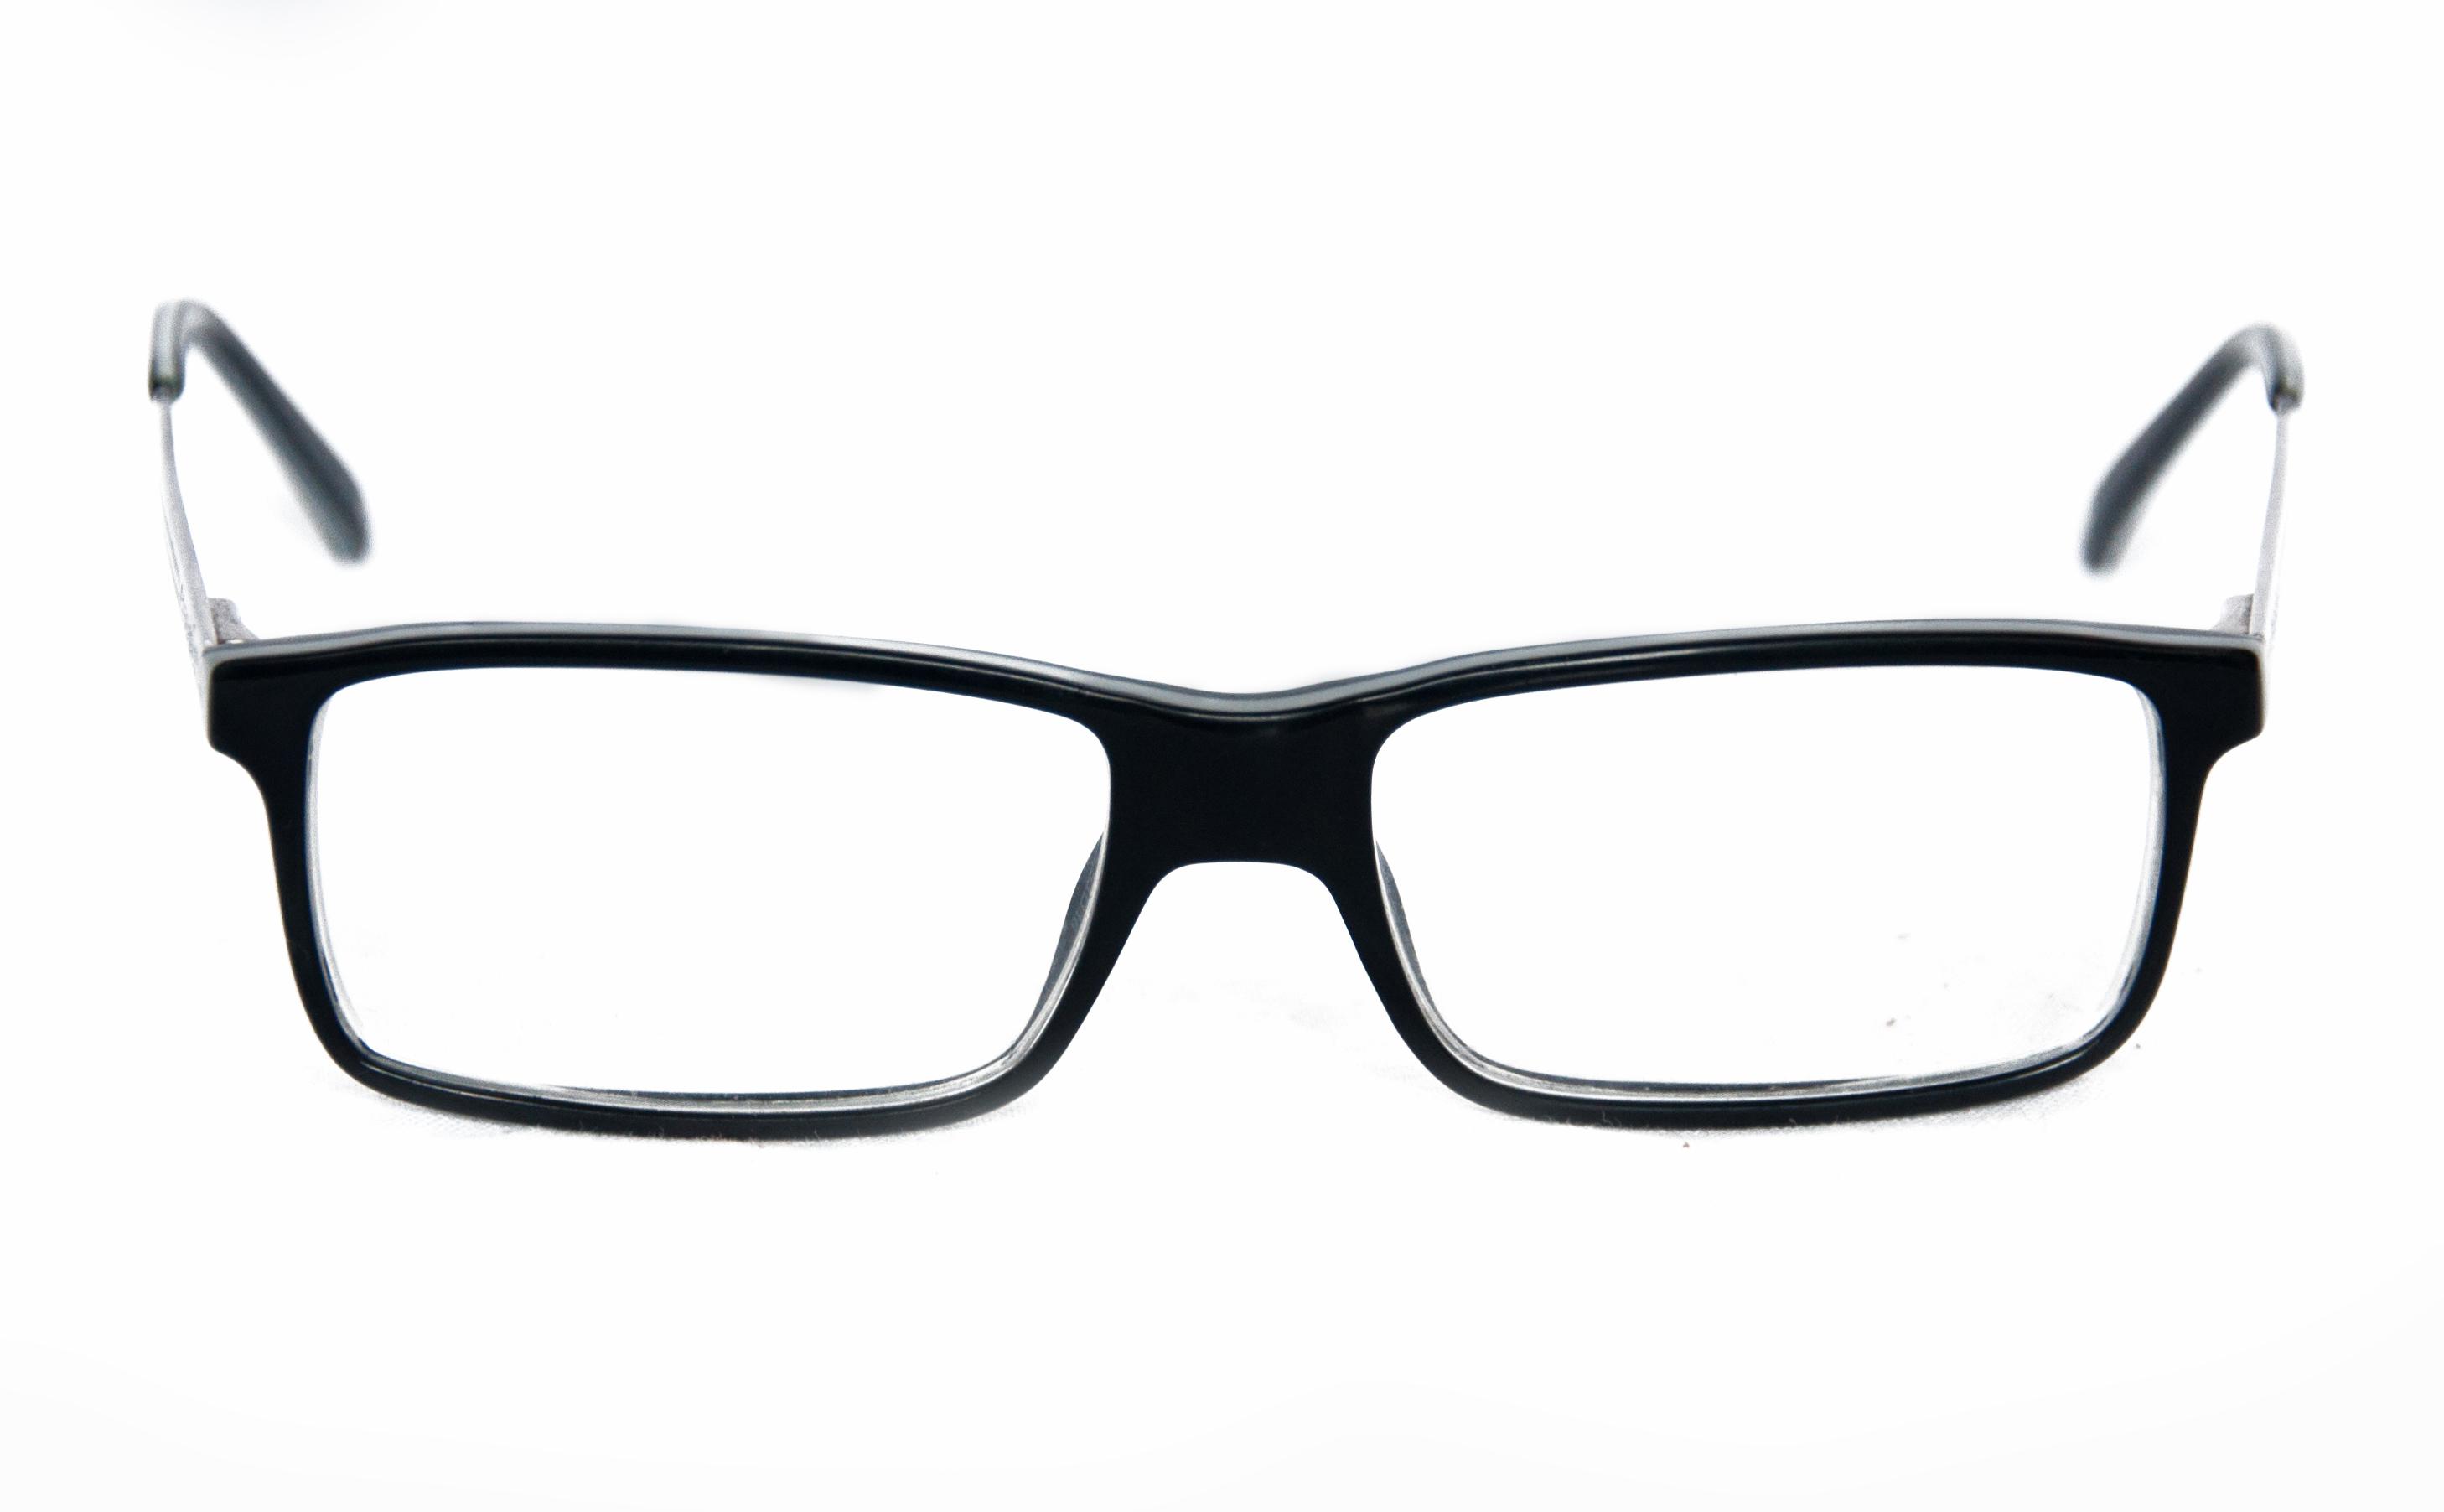 eye glasses, White, Looking, Style, Studio, HQ Photo